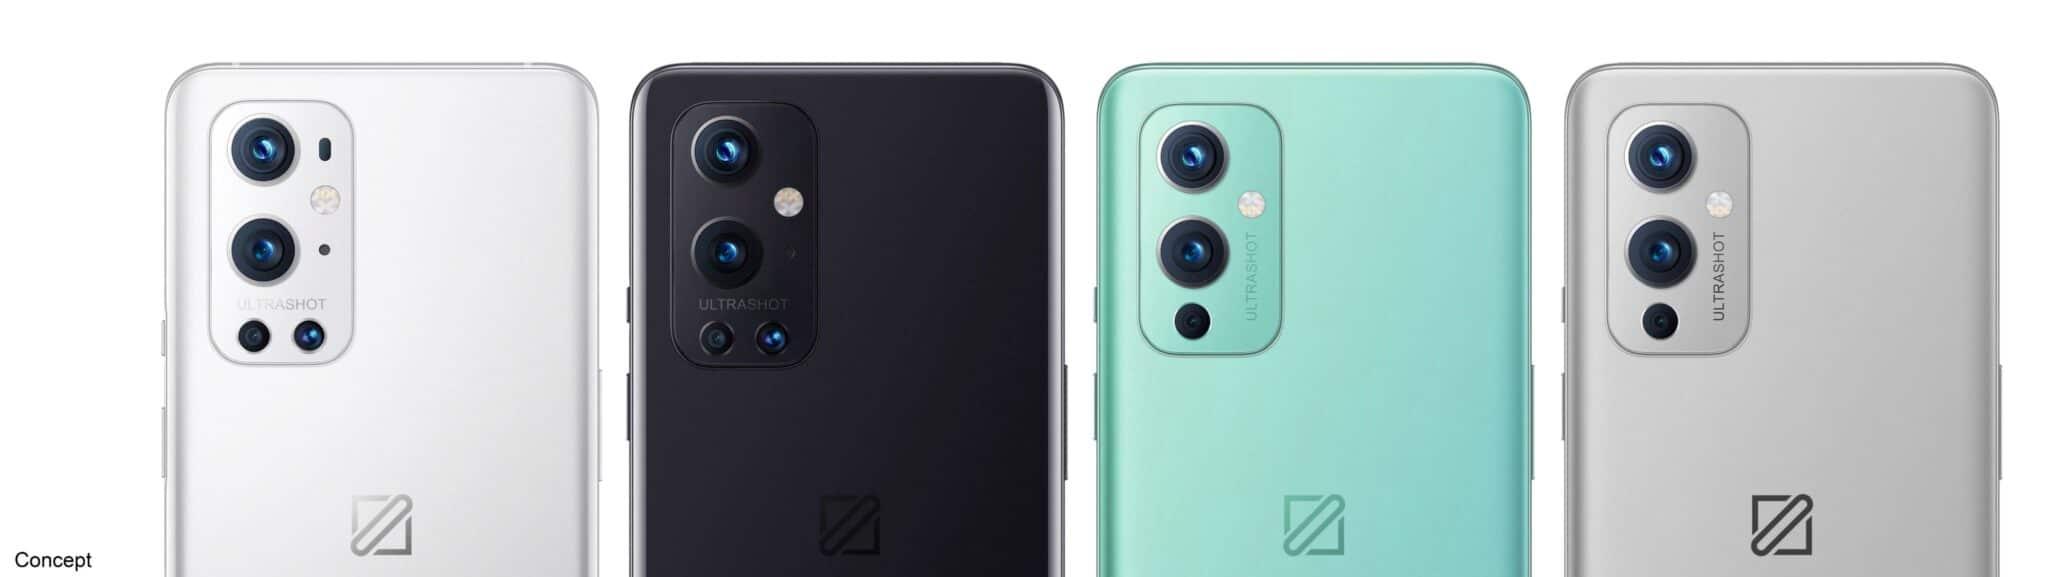 colores-OnePlus-9-descartados